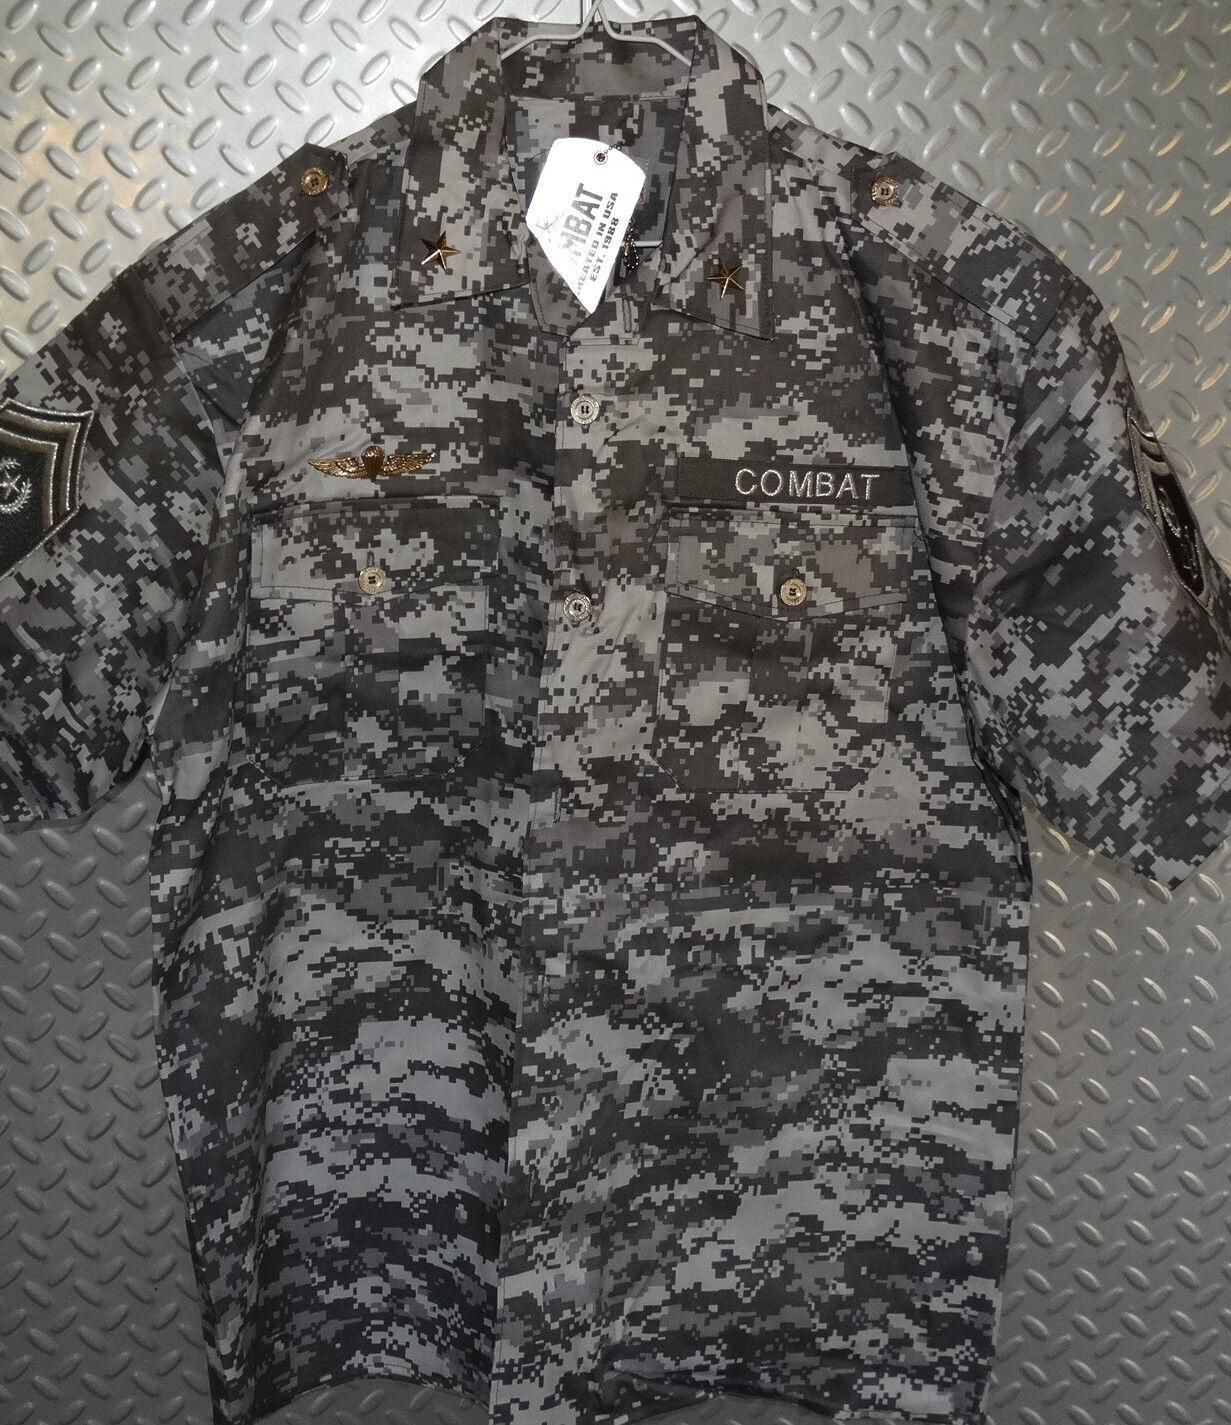 12572  REGAL MILITARY CAMO COMBAT FORCE SHIRT w  Patches Badges Medals  XL